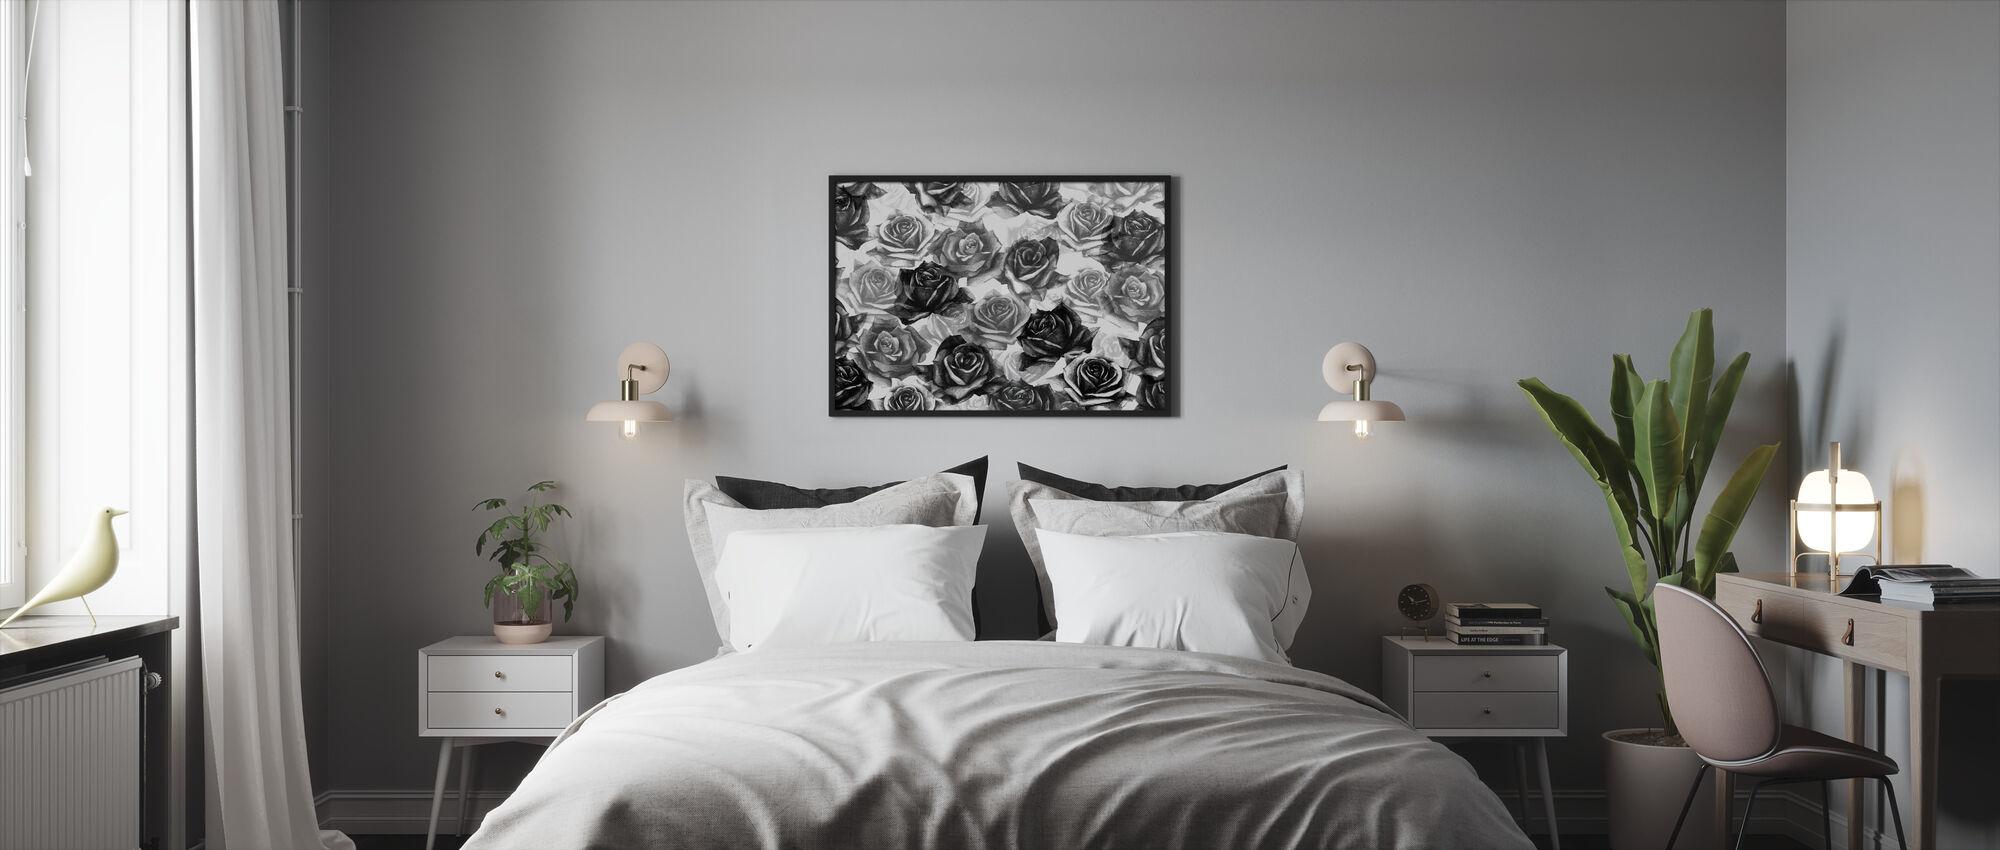 My Black Roses - Framed print - Bedroom